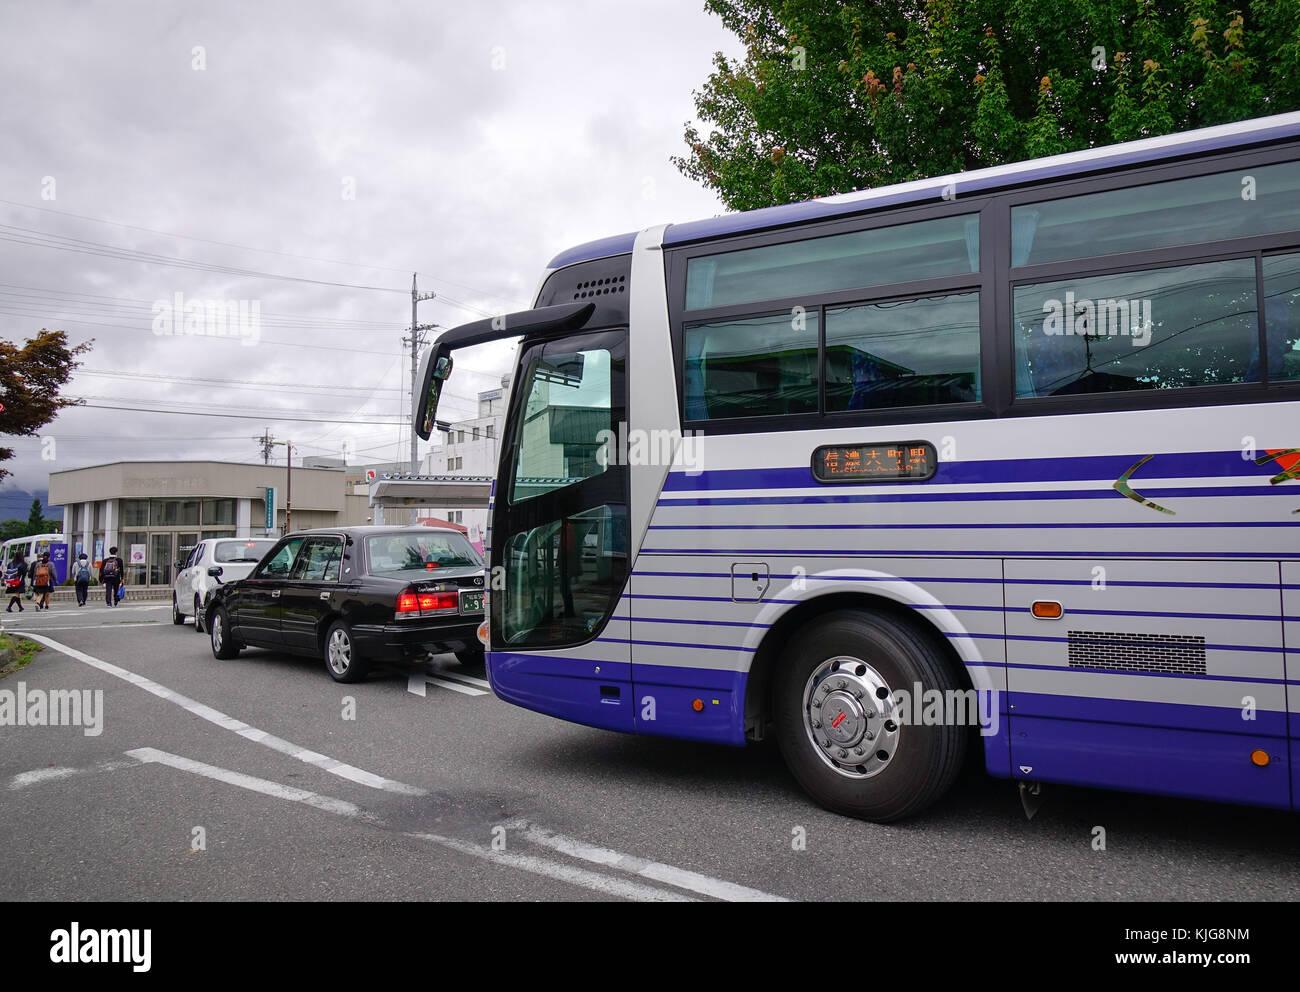 tokyo tour bus stockfotos tokyo tour bus bilder alamy. Black Bedroom Furniture Sets. Home Design Ideas